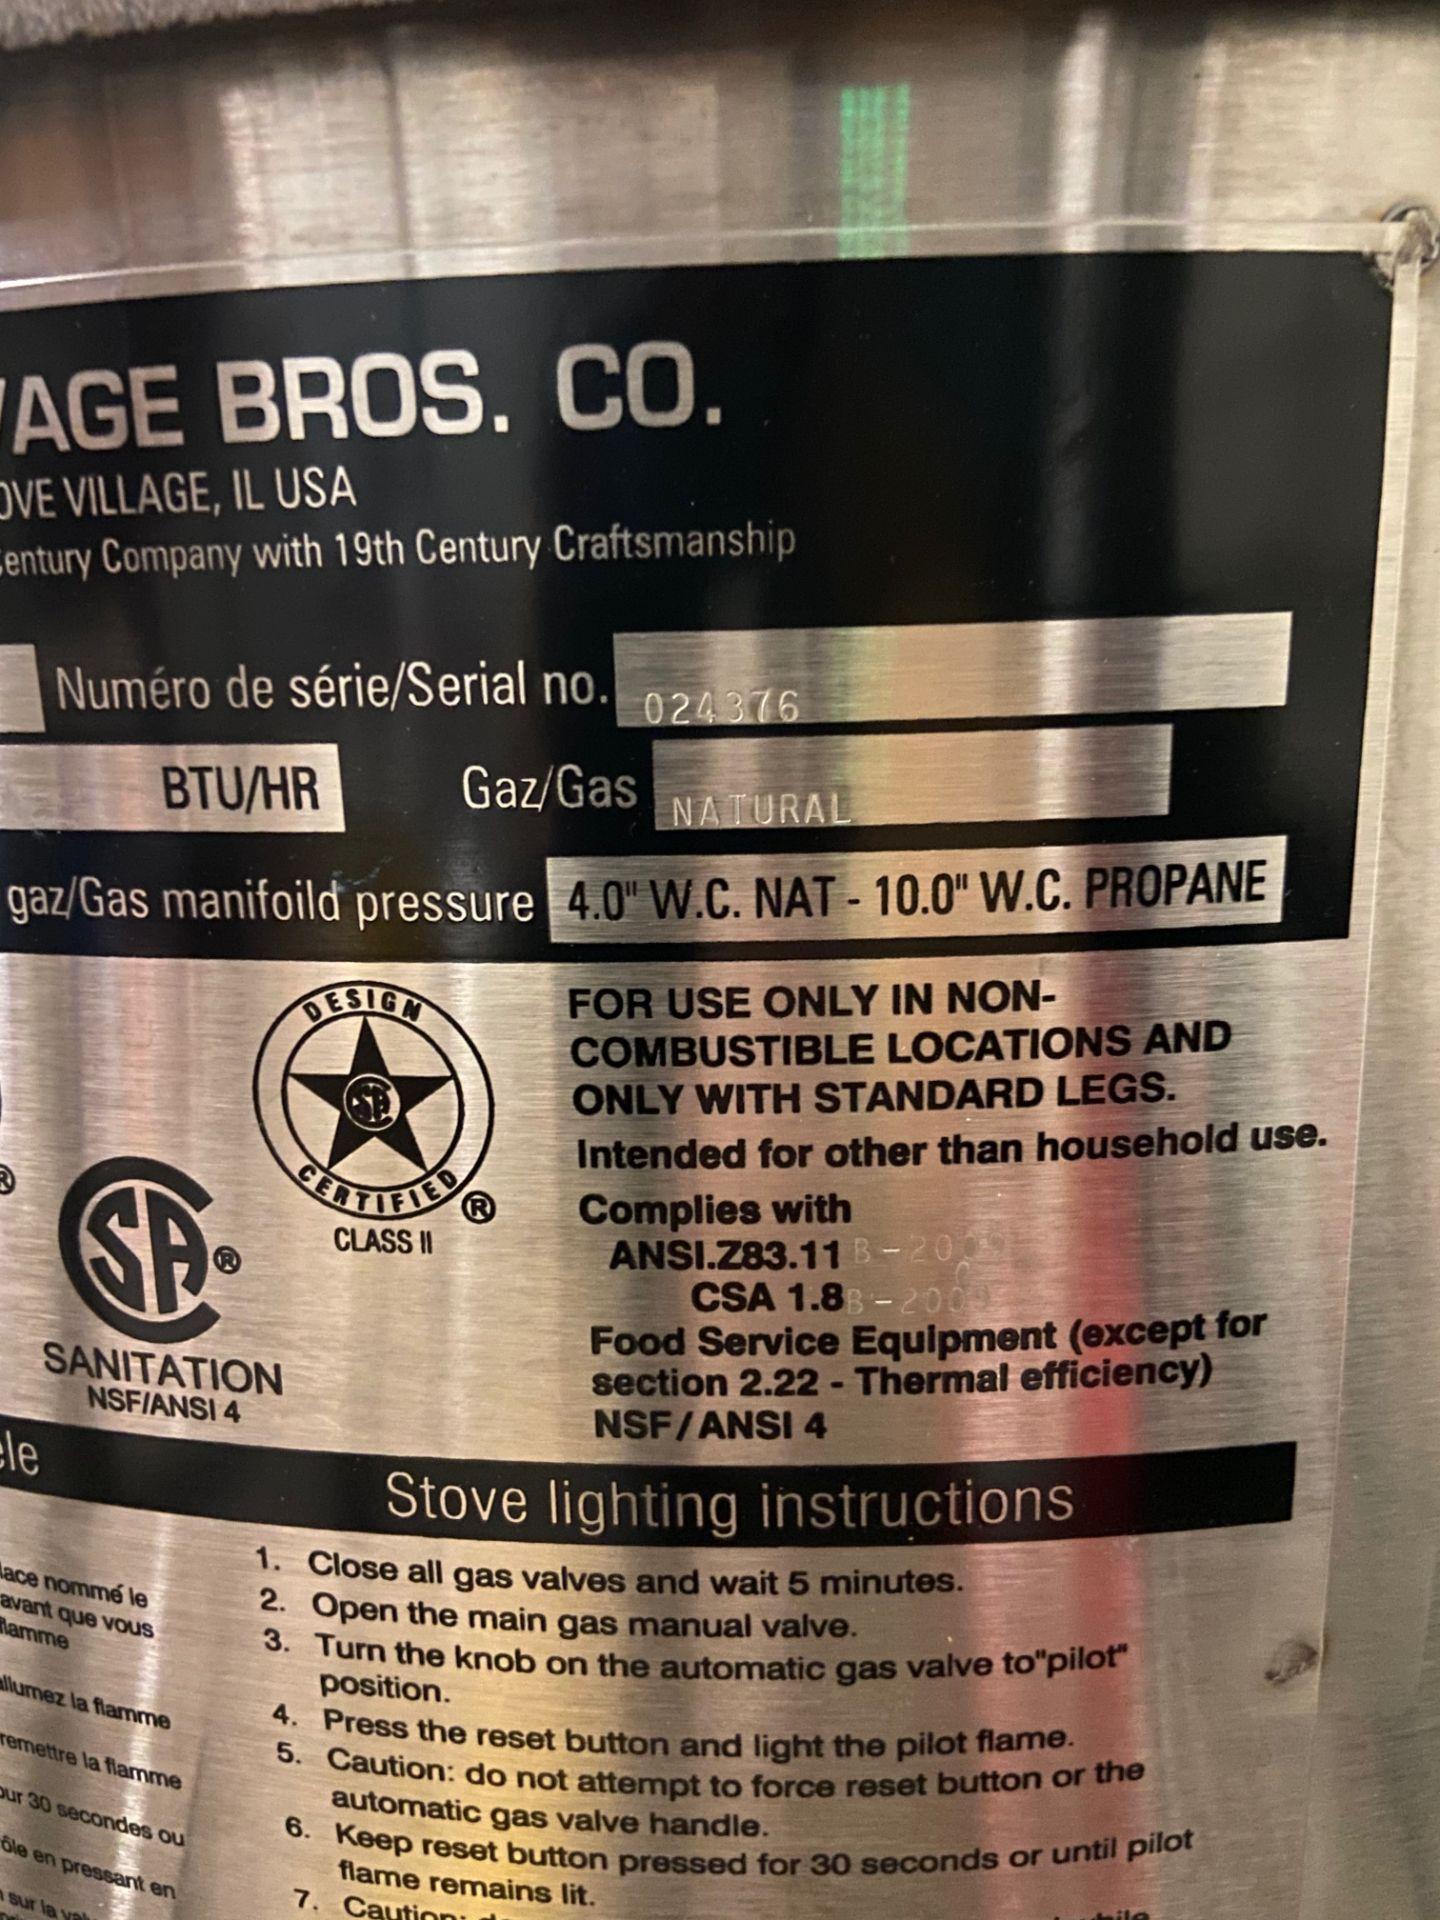 NEW Savage Bros Gas Candy Stove, Model# 20B, Serial# 024376, 80,000 BTU/HR - Image 3 of 6